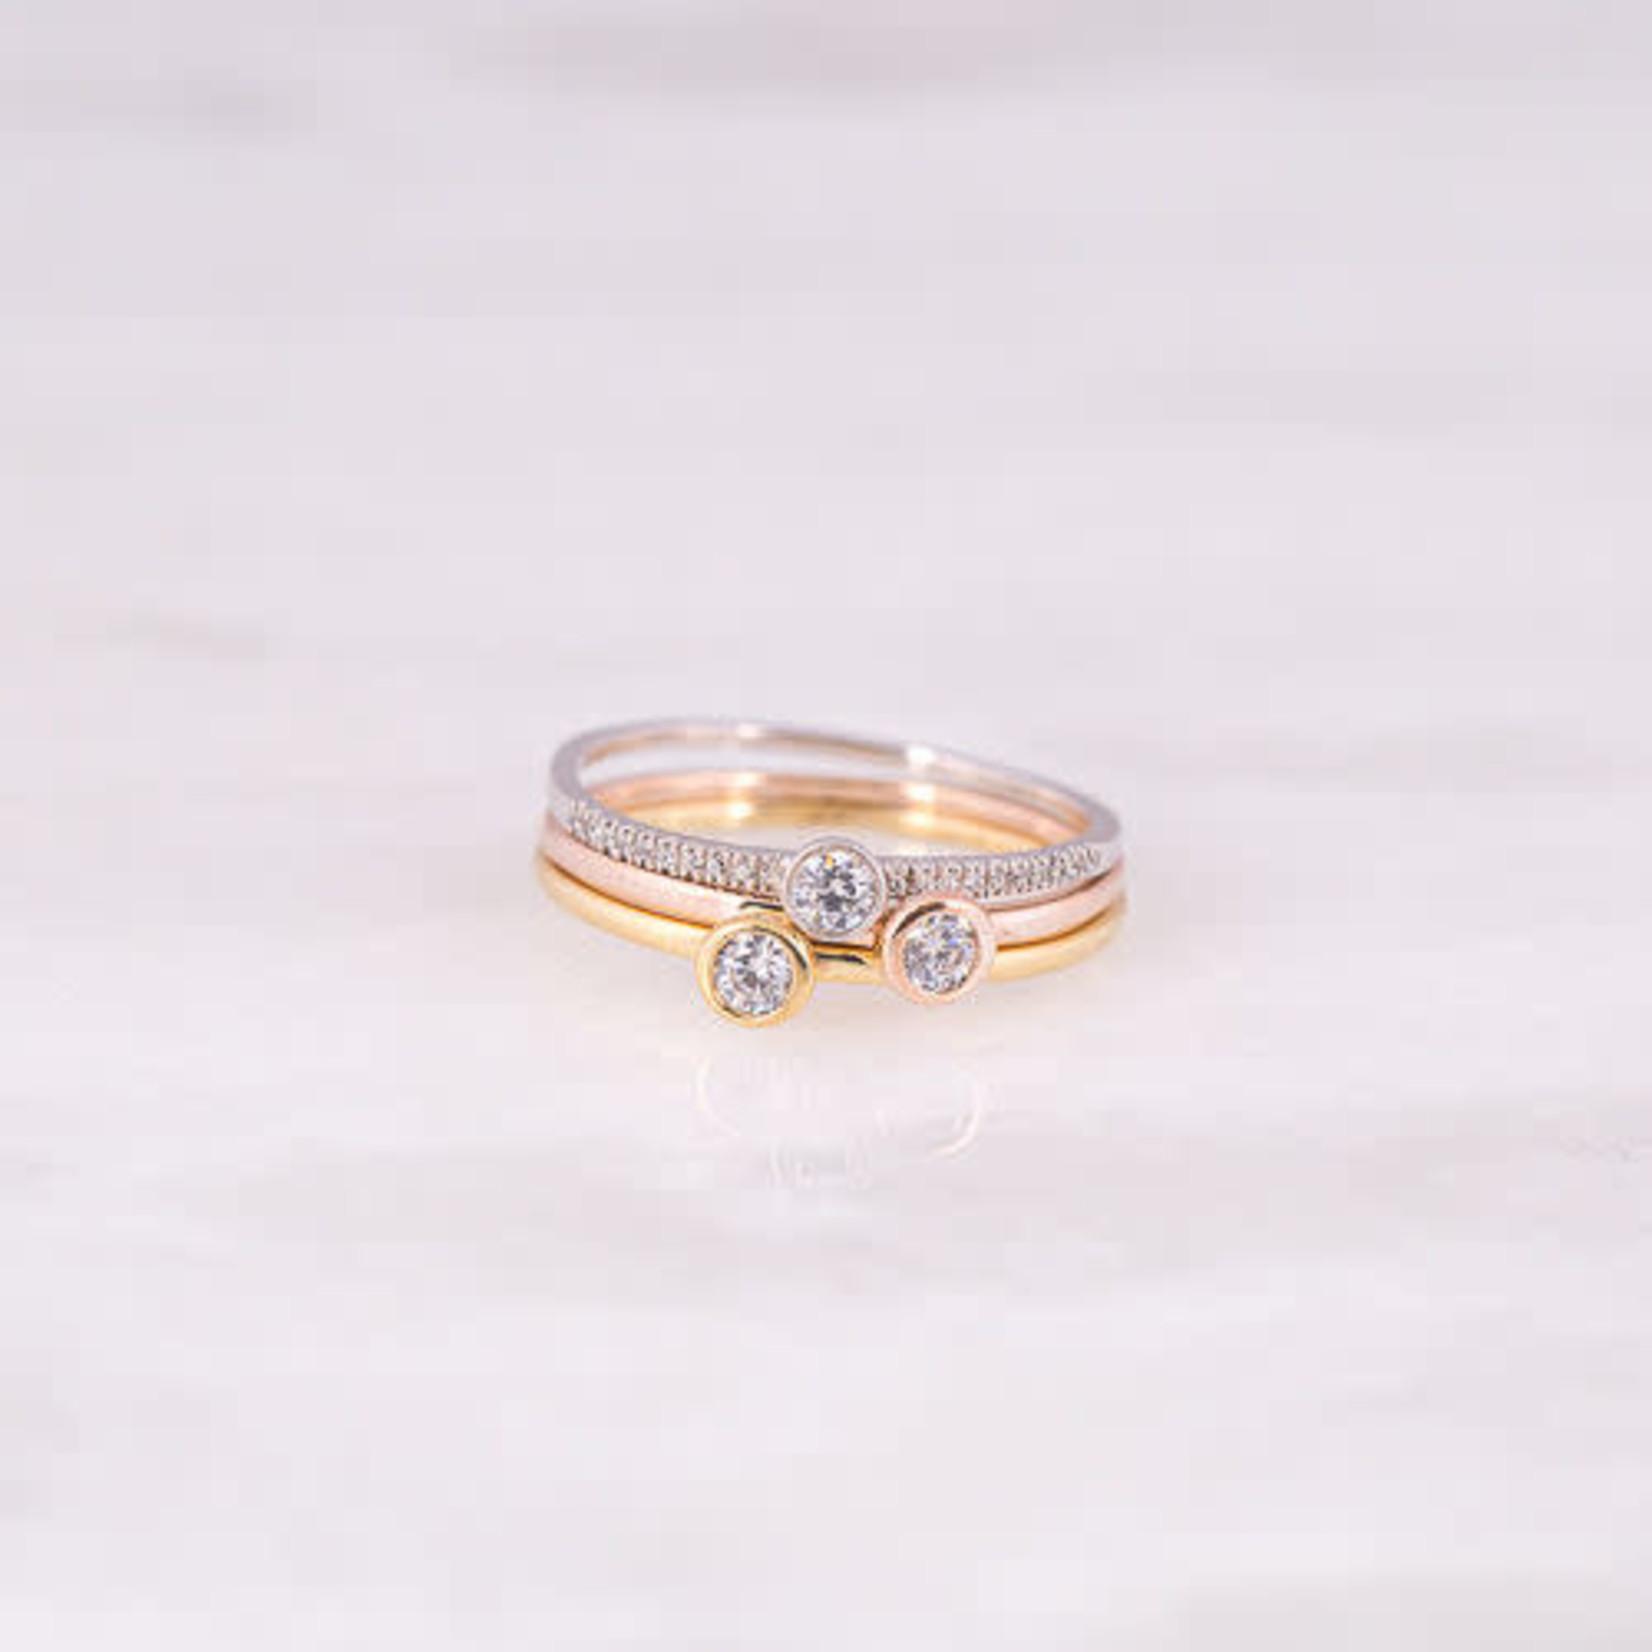 14K Yellow Gold Diamond Bezel Ring 0.07CTW